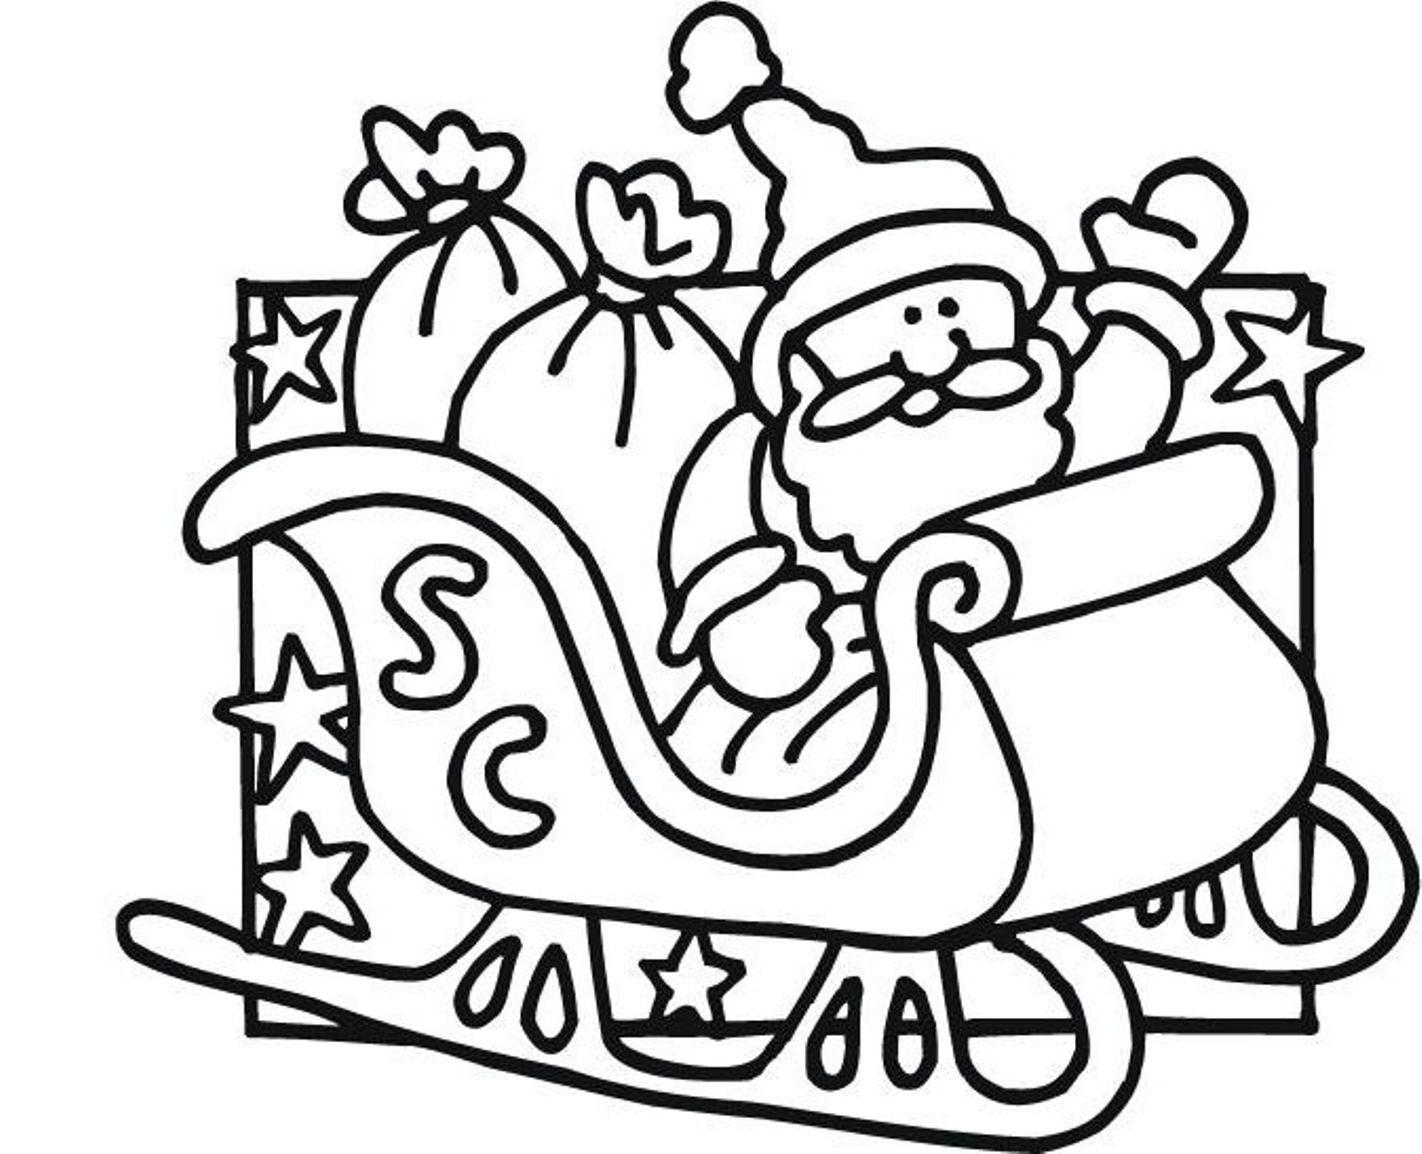 1422x1154 Santa Claus Coloring Pages Printable